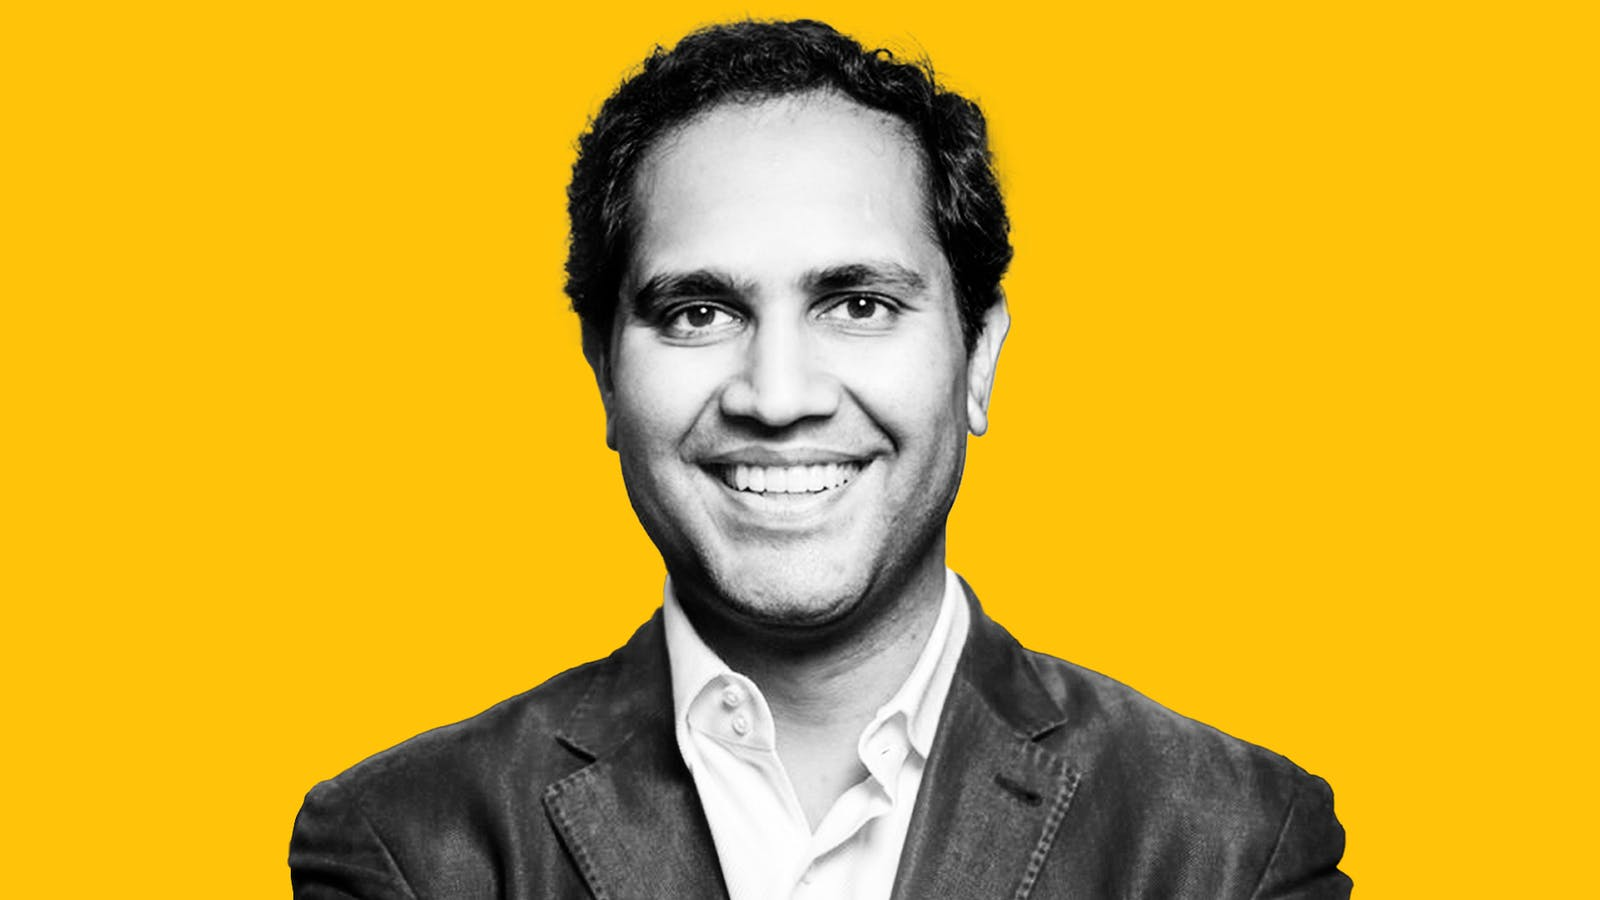 Better.com founder Vishal Garg. Image: Better.com